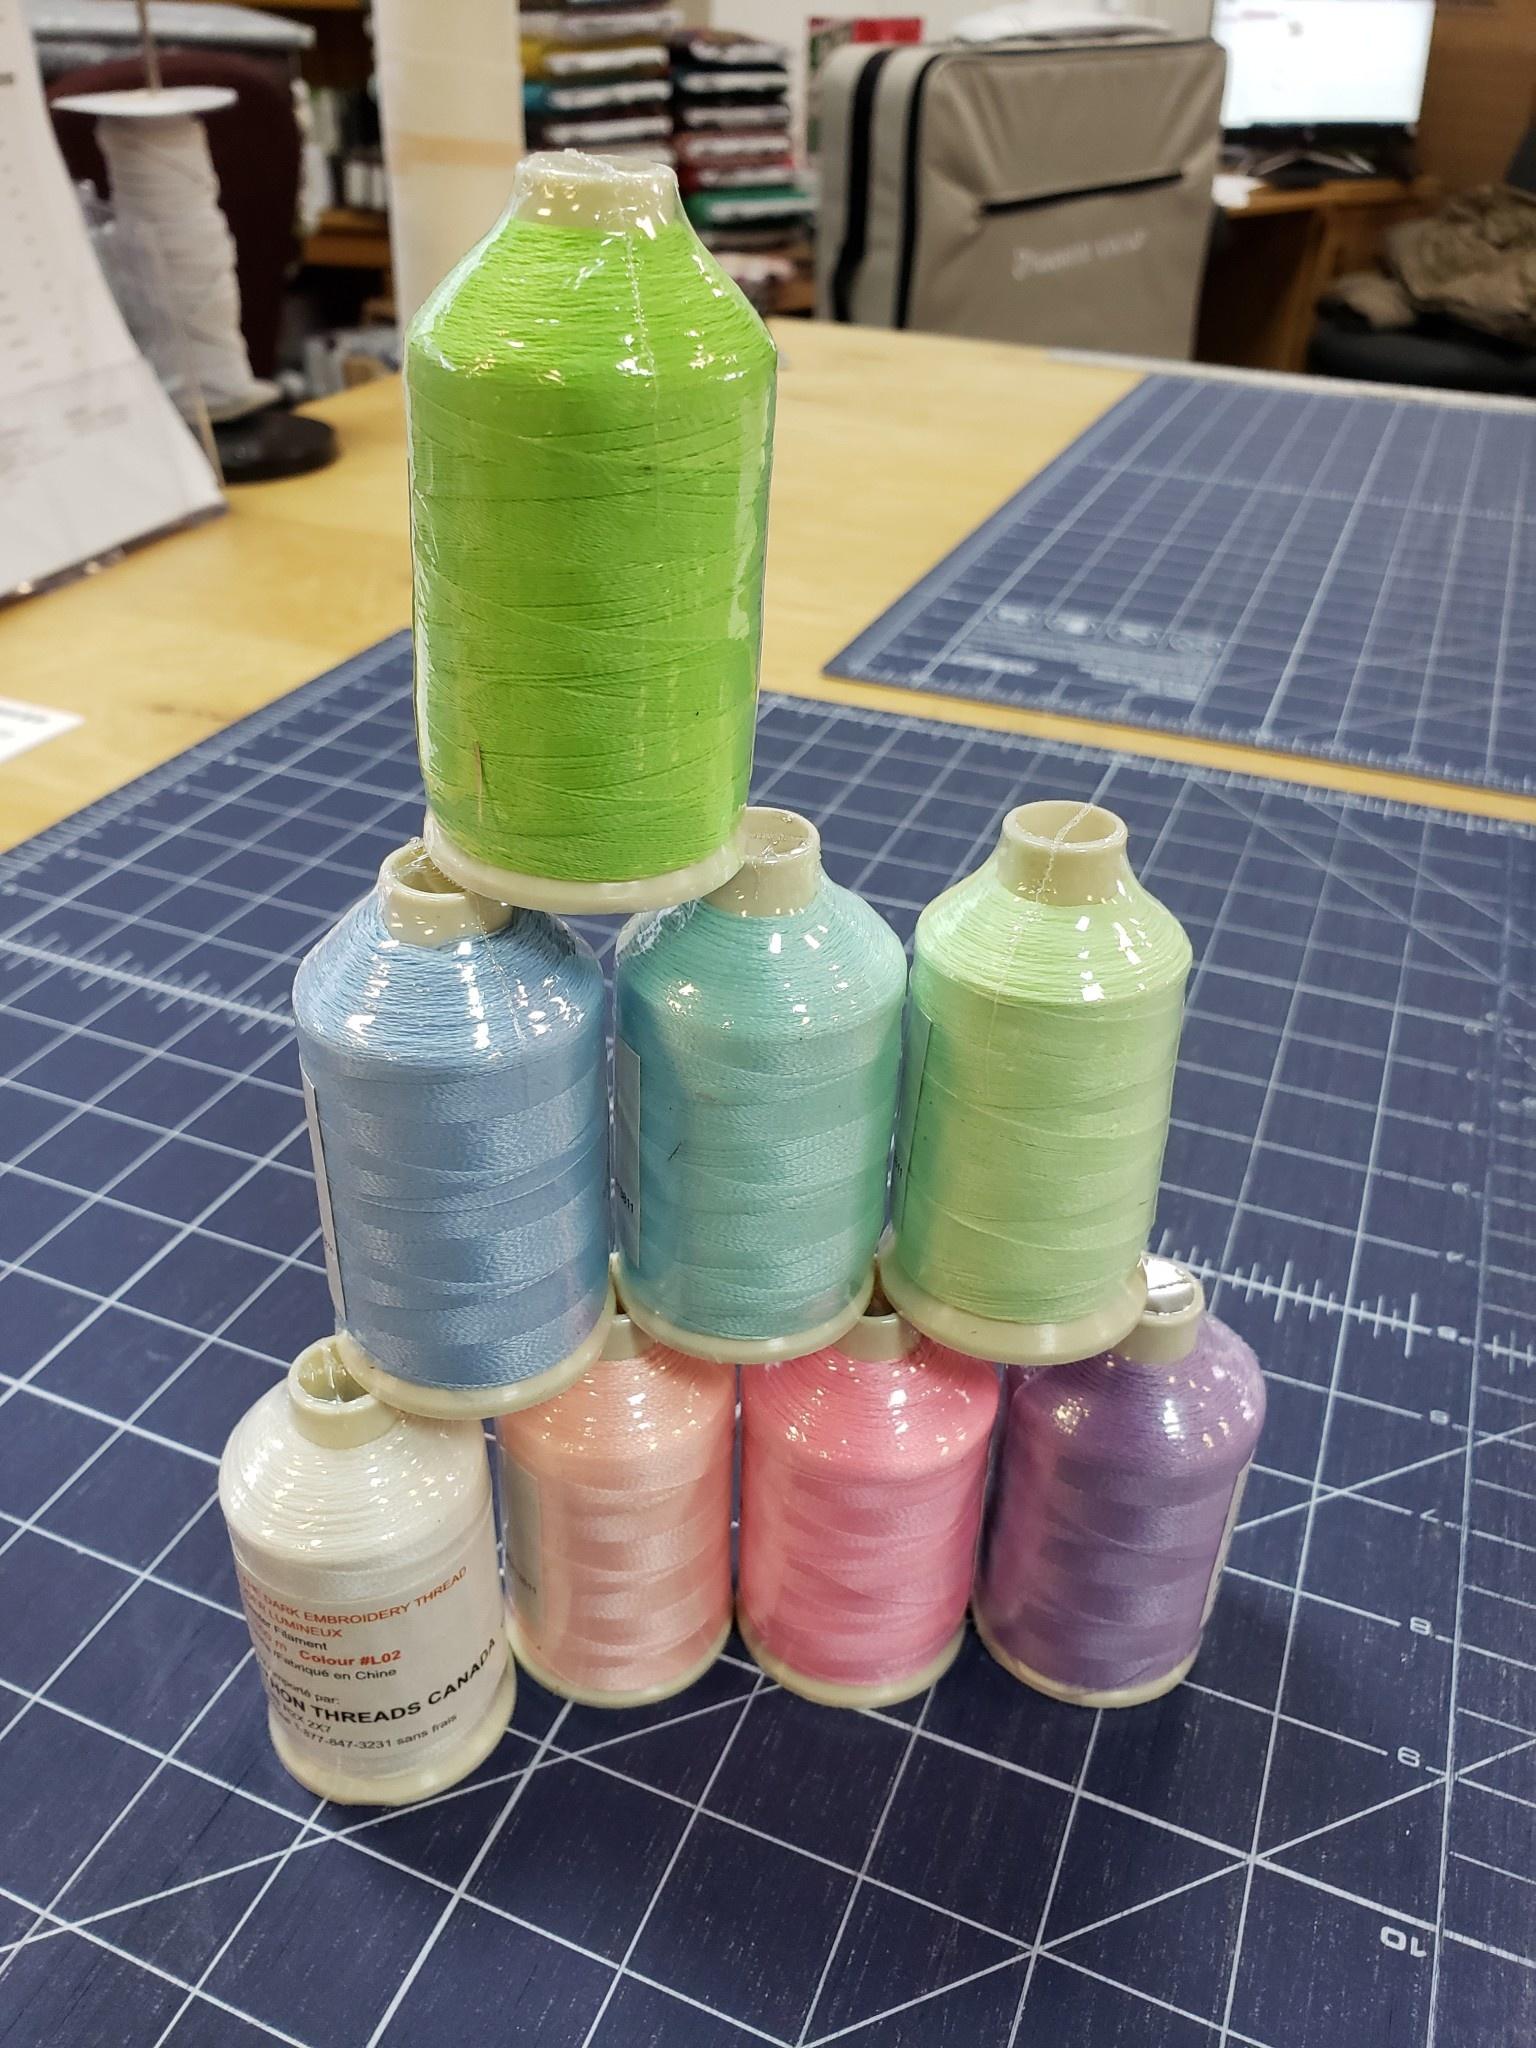 MARATHON Set of 8 (1,000 m) Spools Glow in the Dark Thread 100% Polyester